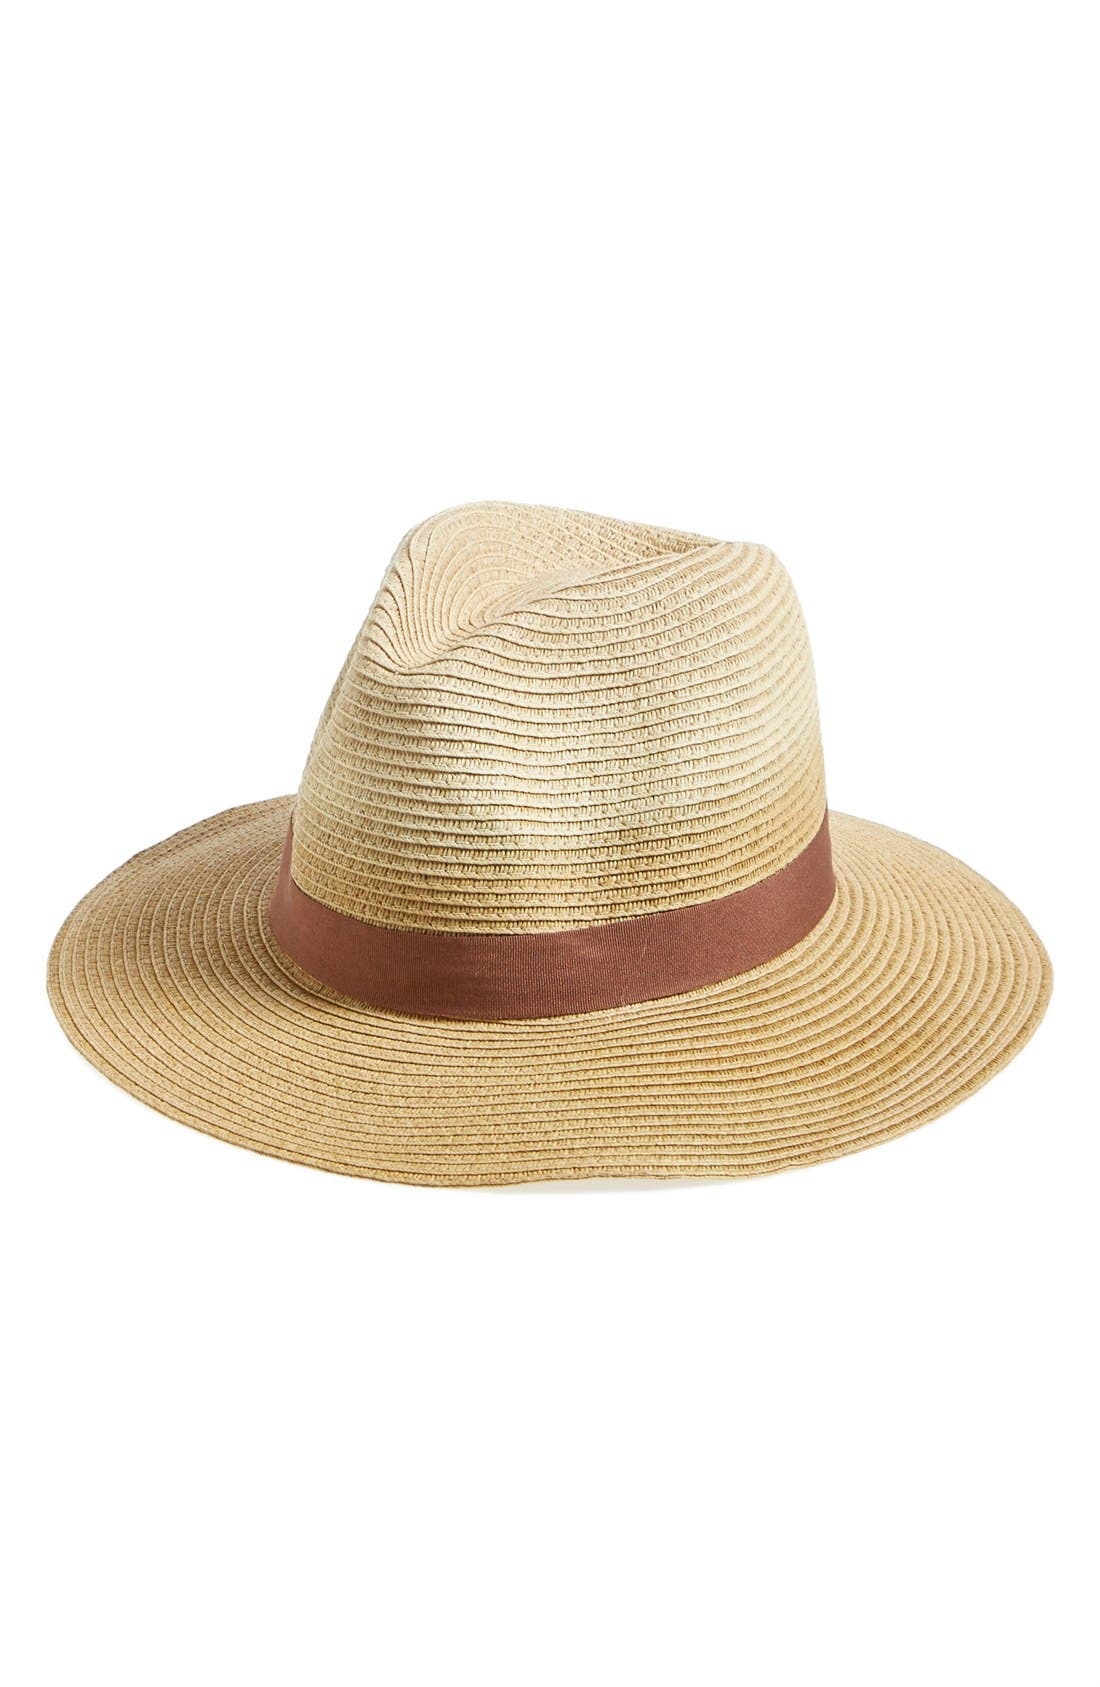 T+C BY THEODORA & CALLUM Dip Dye Straw Panama Hat, Main, color, 250